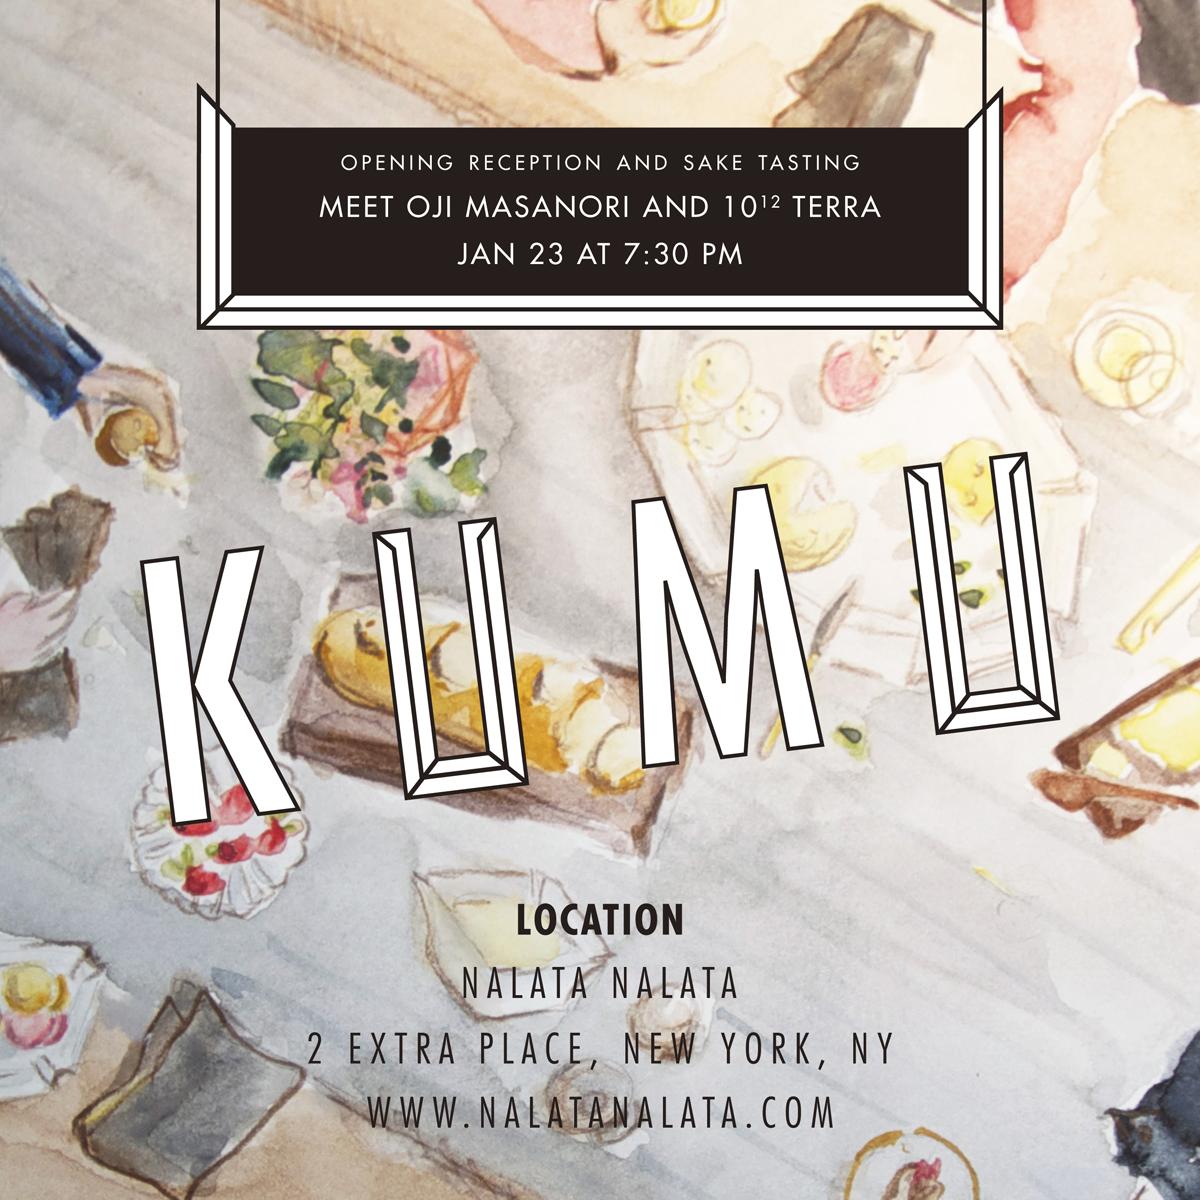 [展示会]KUMU – Exhibition of works by Oji Masanori & Friends